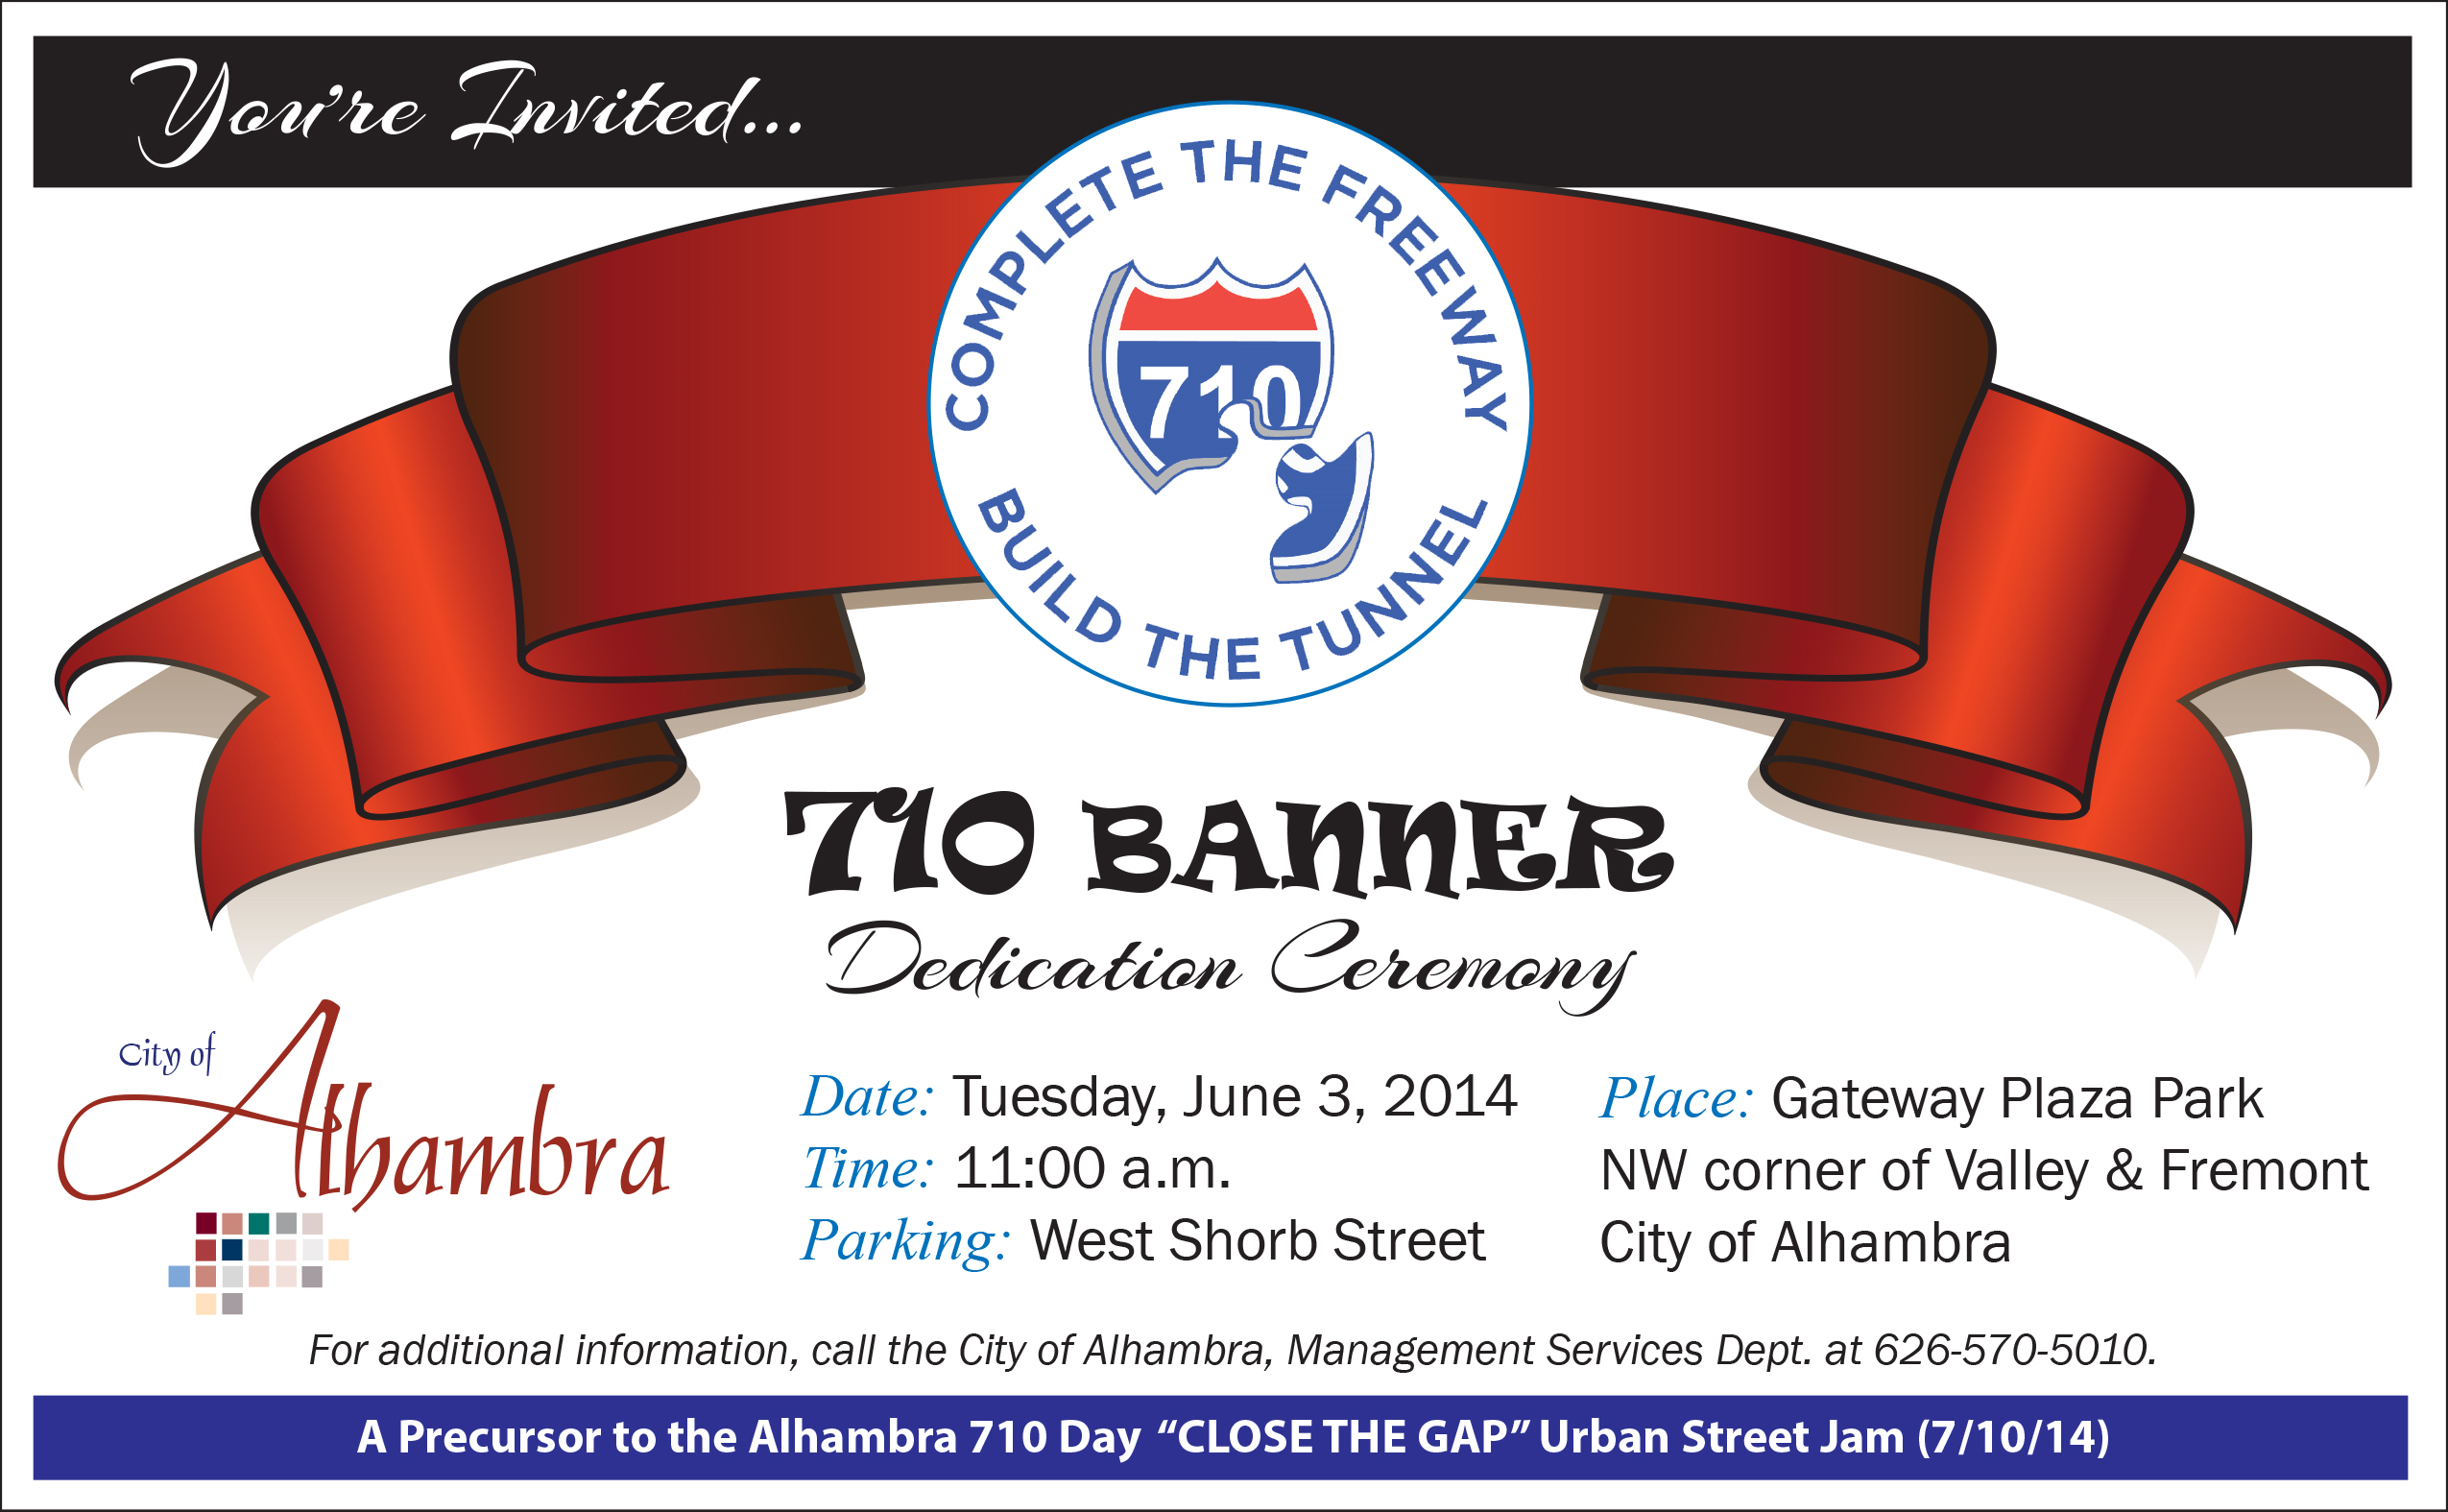 710_Banner_Dedication_Invite.png